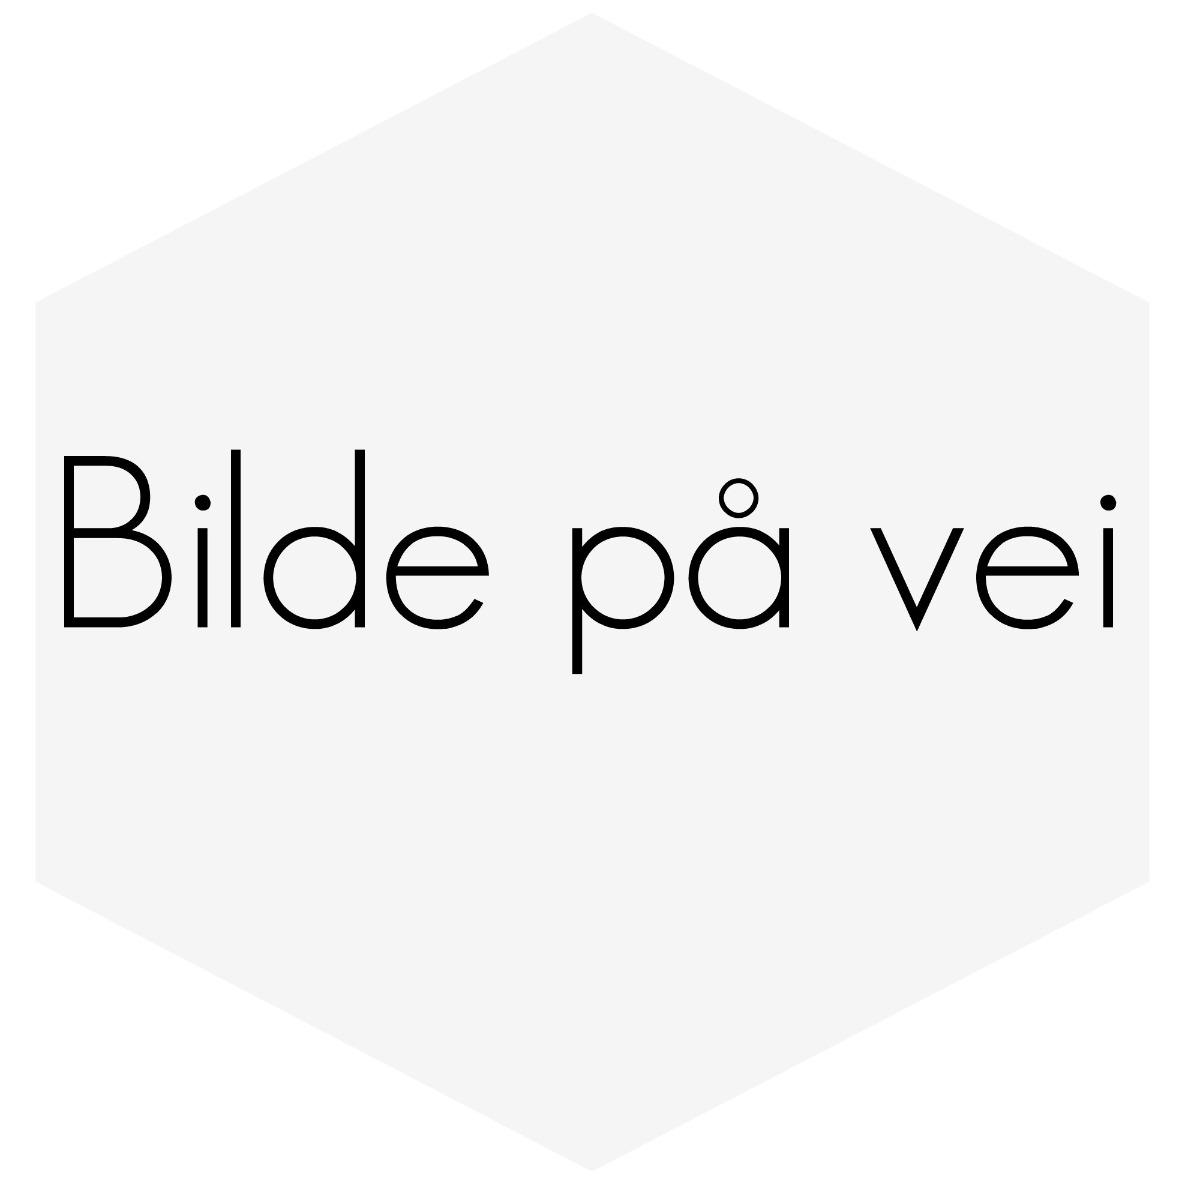 FILTER VEIVHUS 18MM INNVENDIG